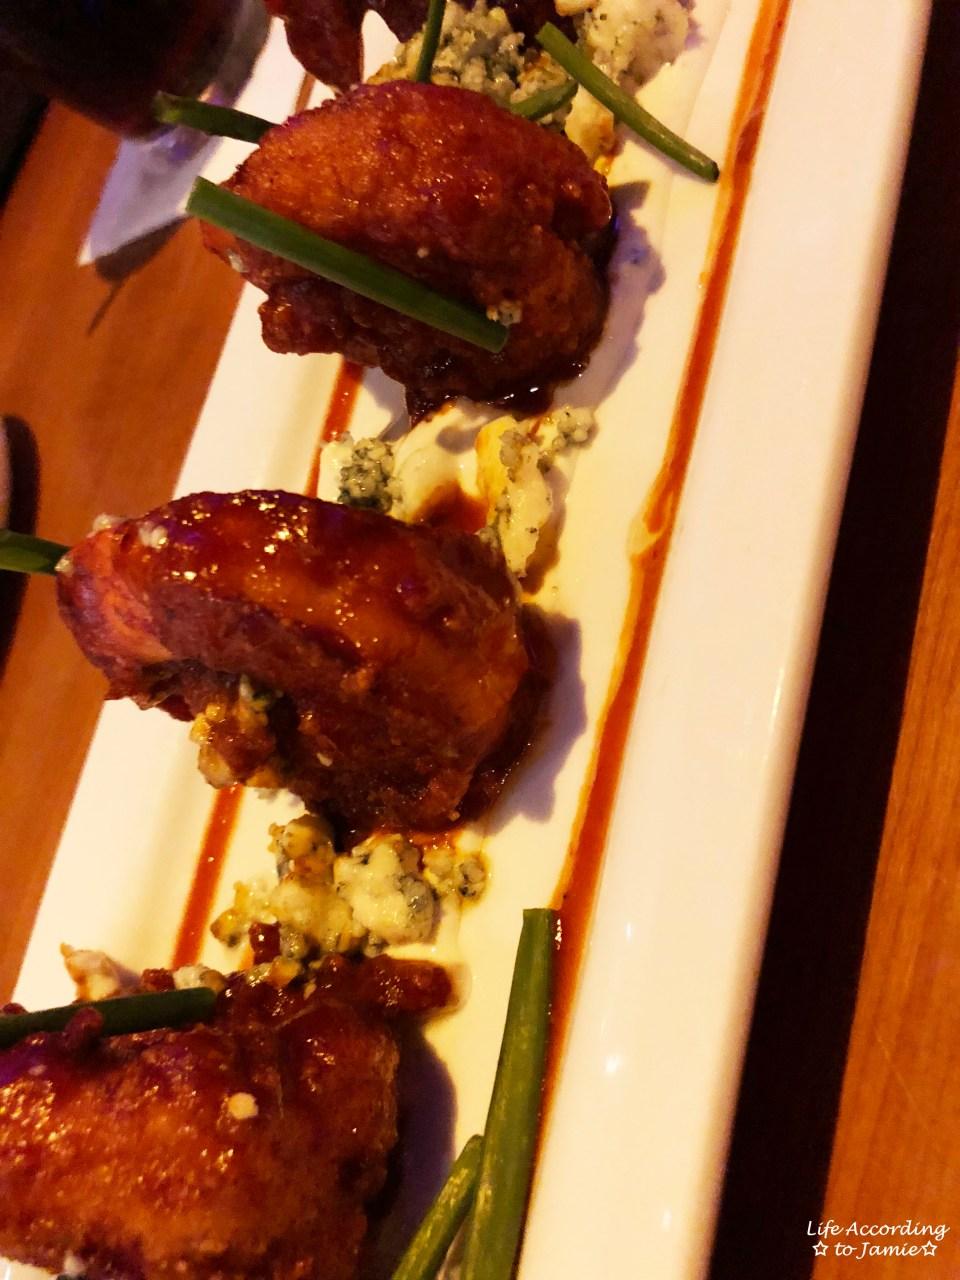 Redstone Grill - Buffalo Jumbo Shrimp